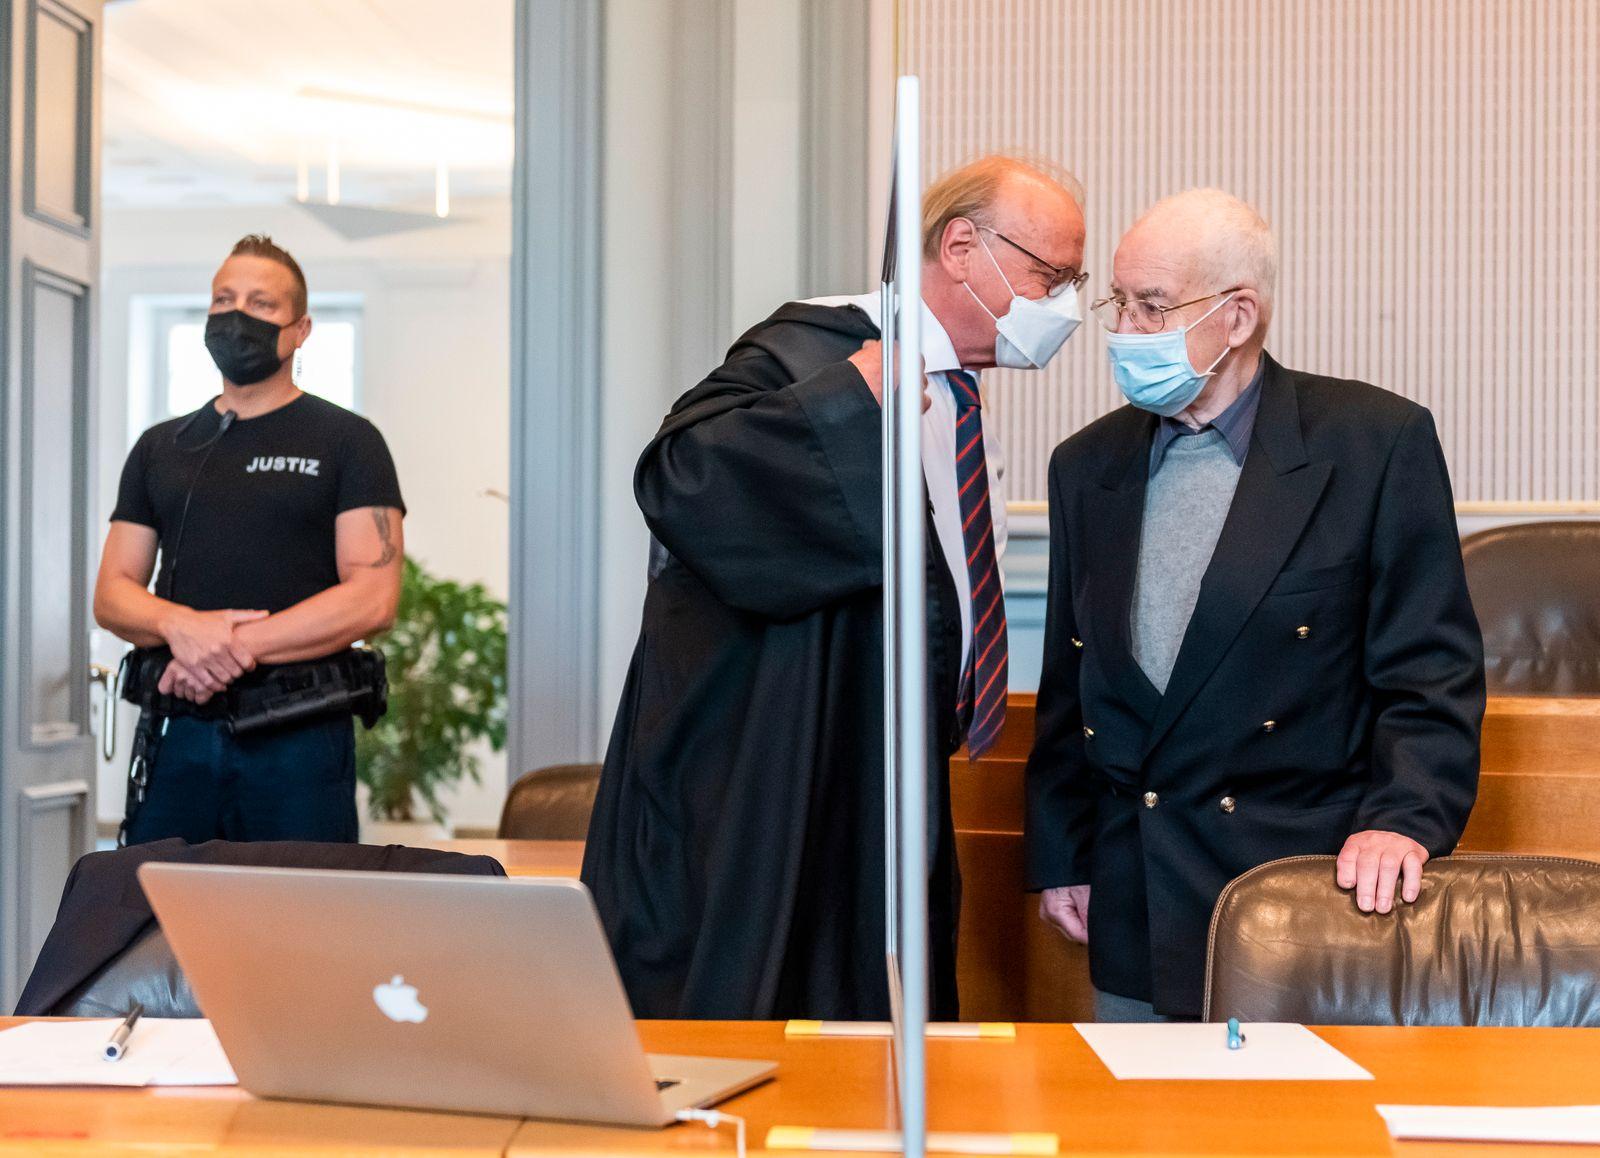 Gerichtstermin_Kiel-2136